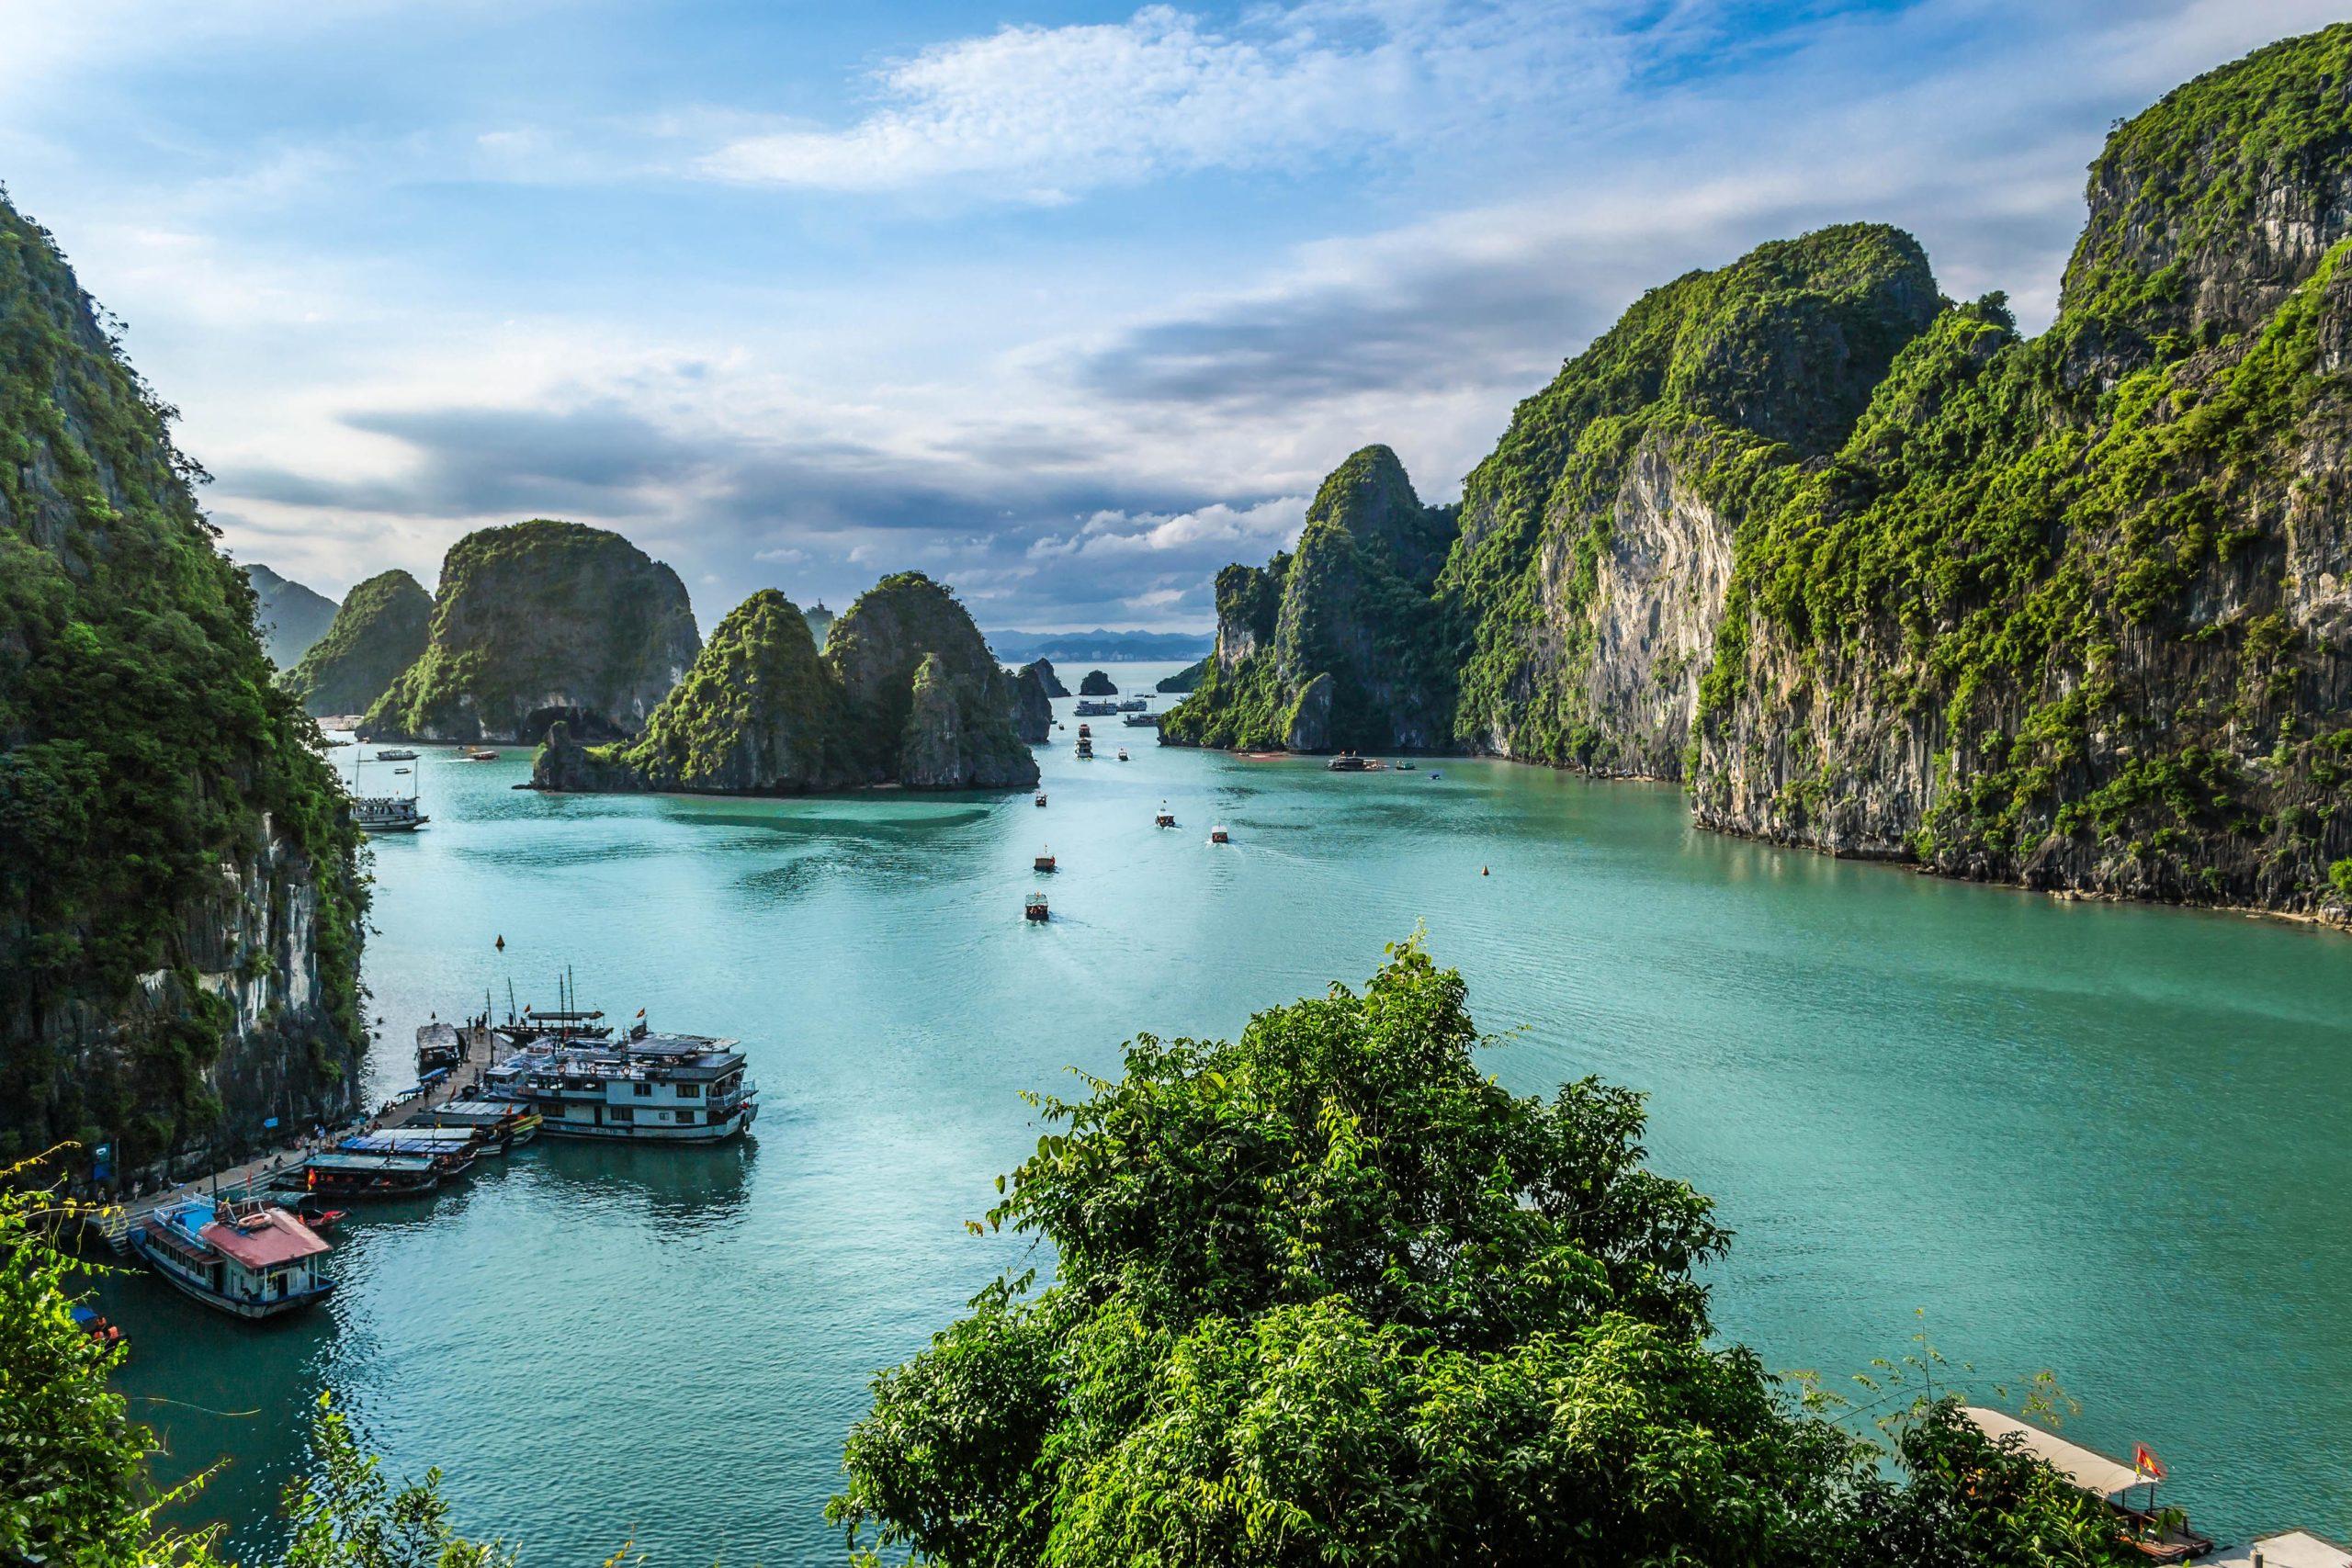 Circuit de 7 jours en moto au Vietnam